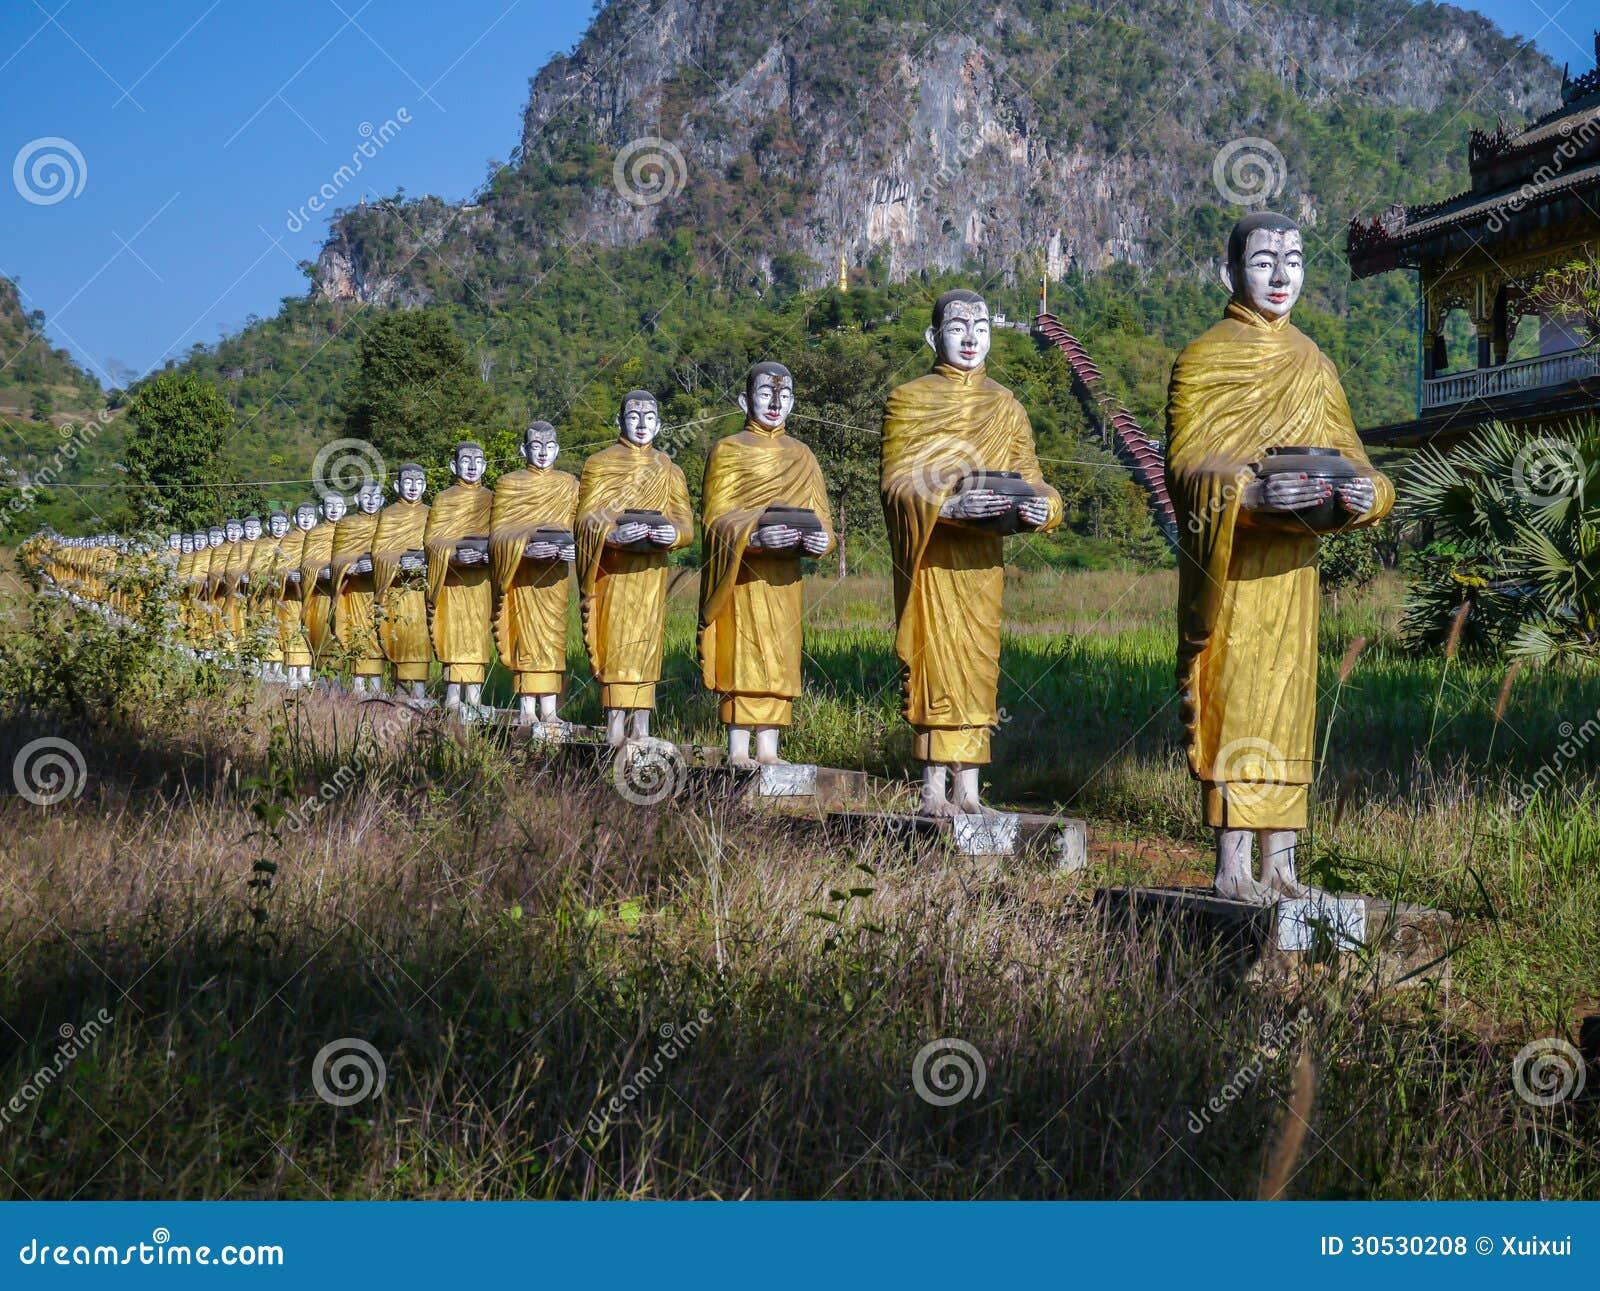 Statues de la promenade de moines bouddhistes rassemblant l aumône